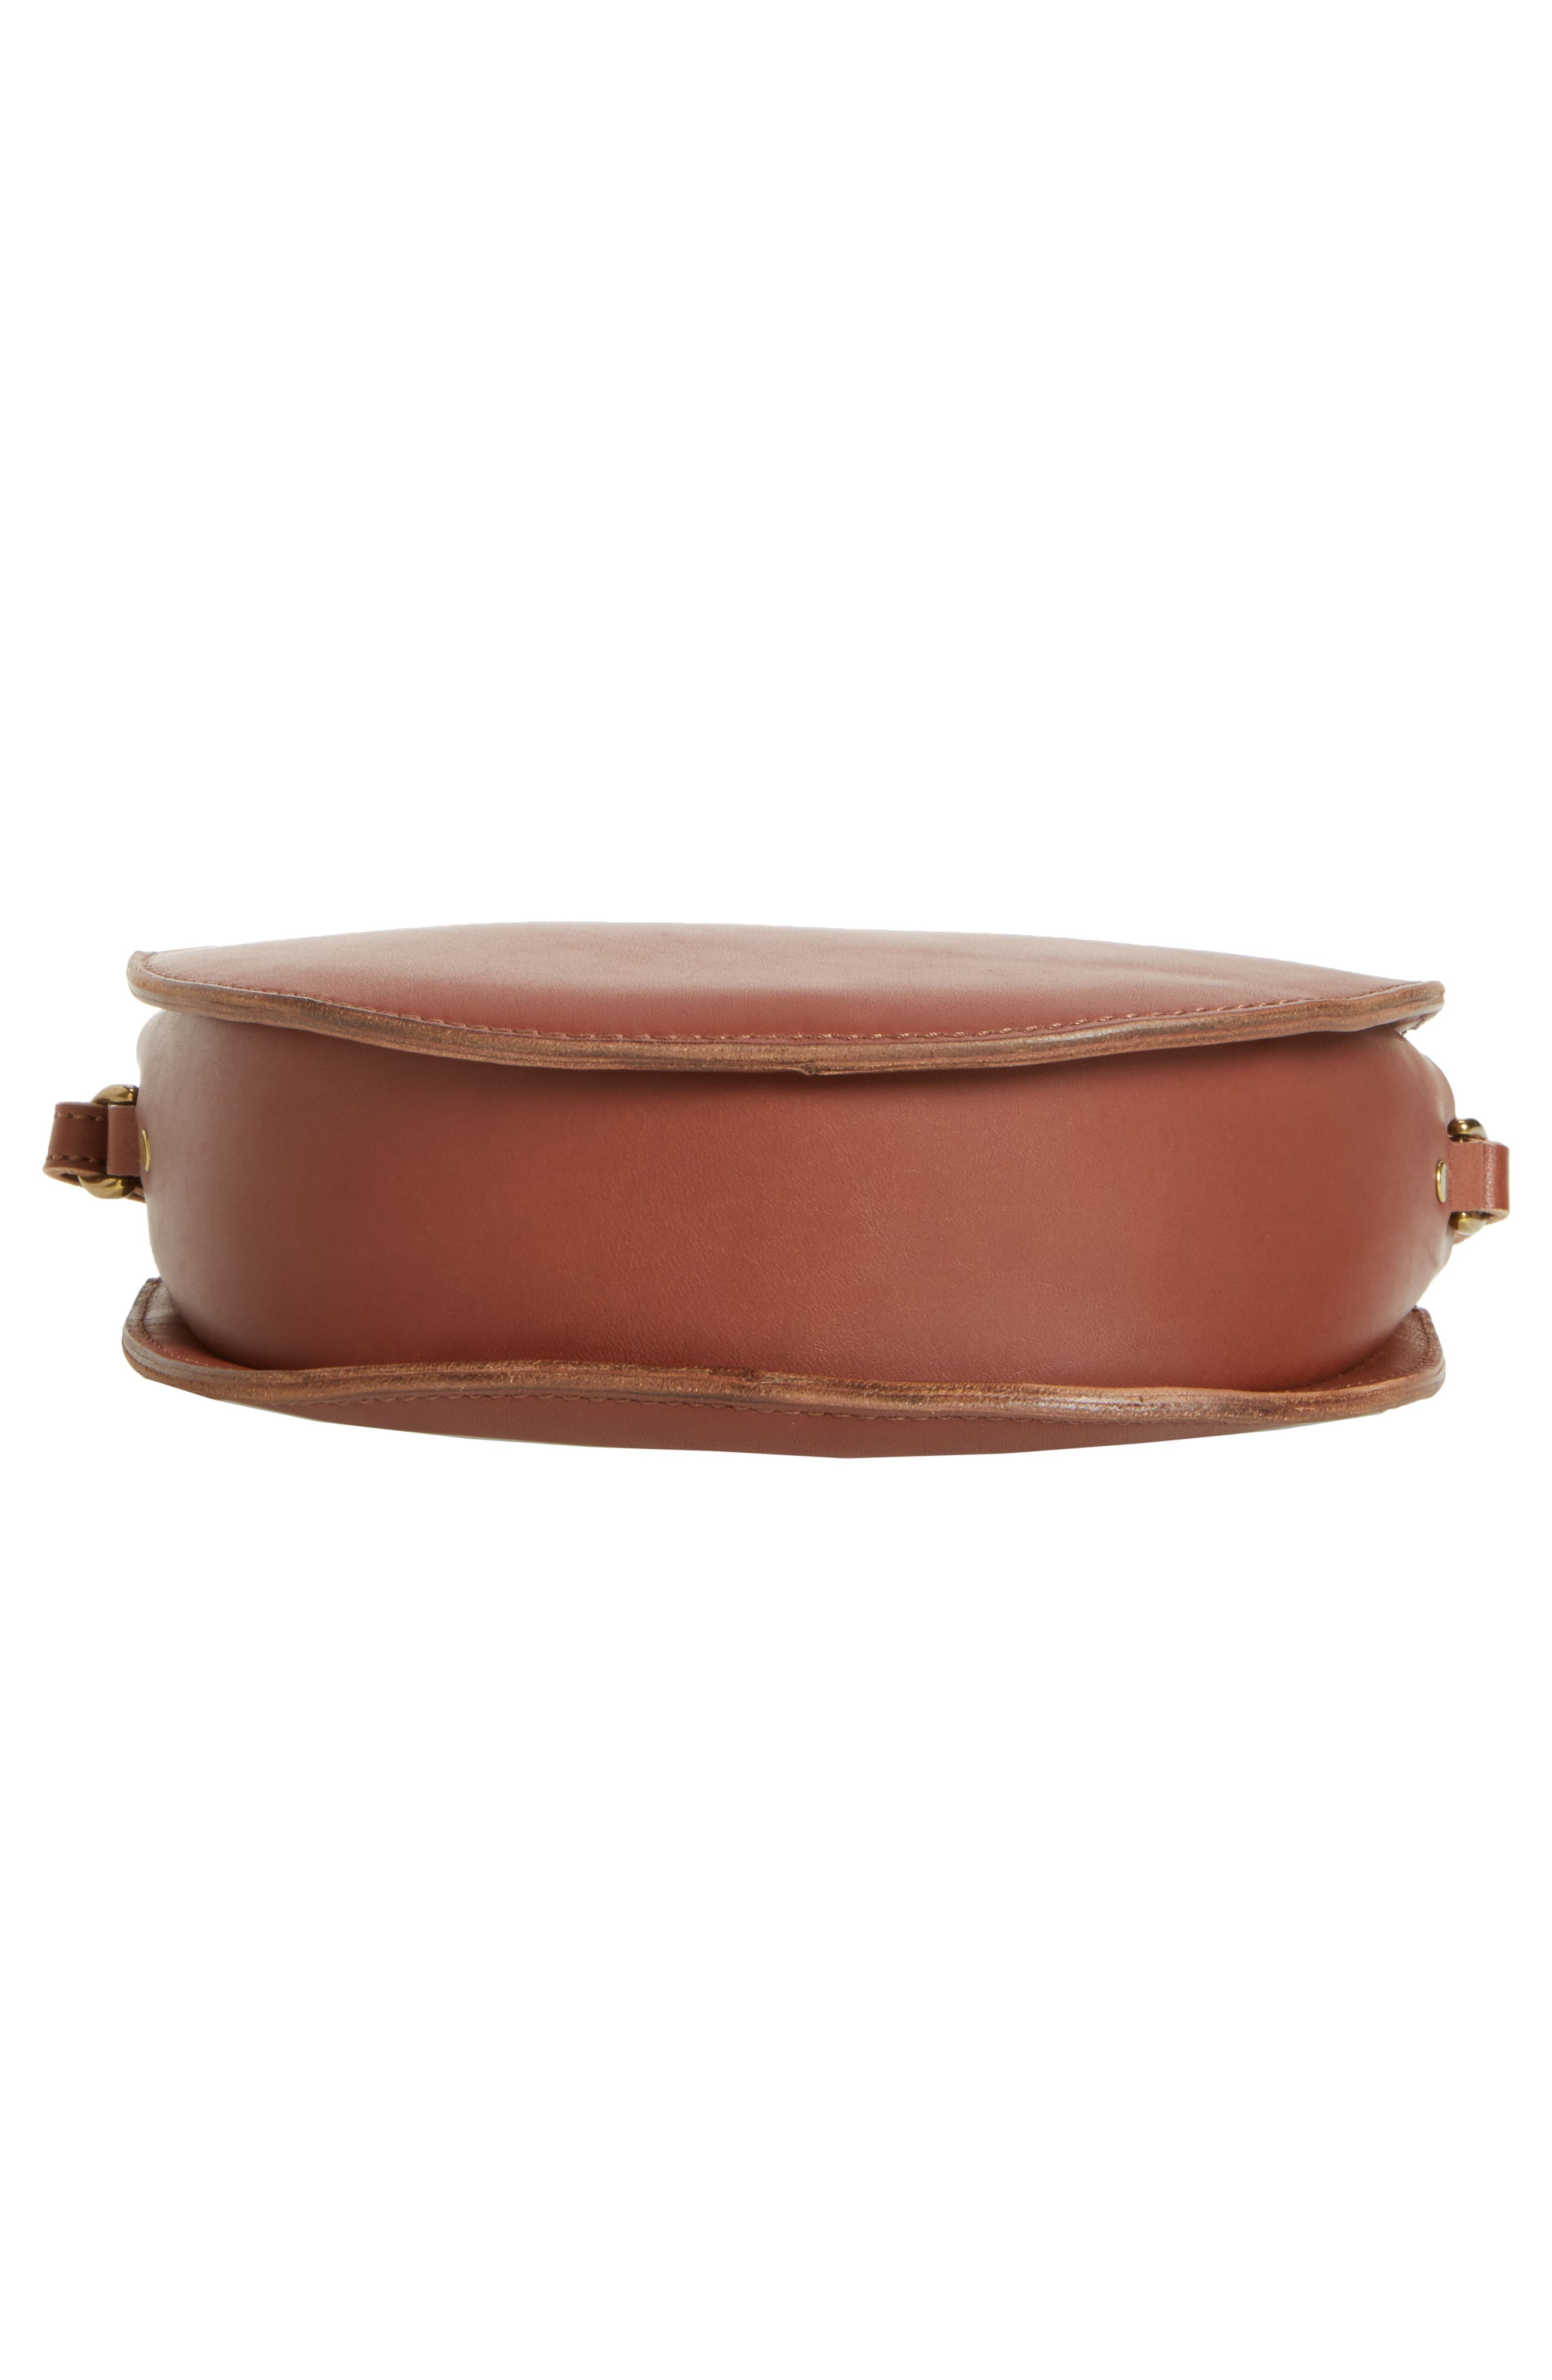 Juniper Vachetta Leather Half Moon Crossbody Bag,                             Alternate thumbnail 18, color,